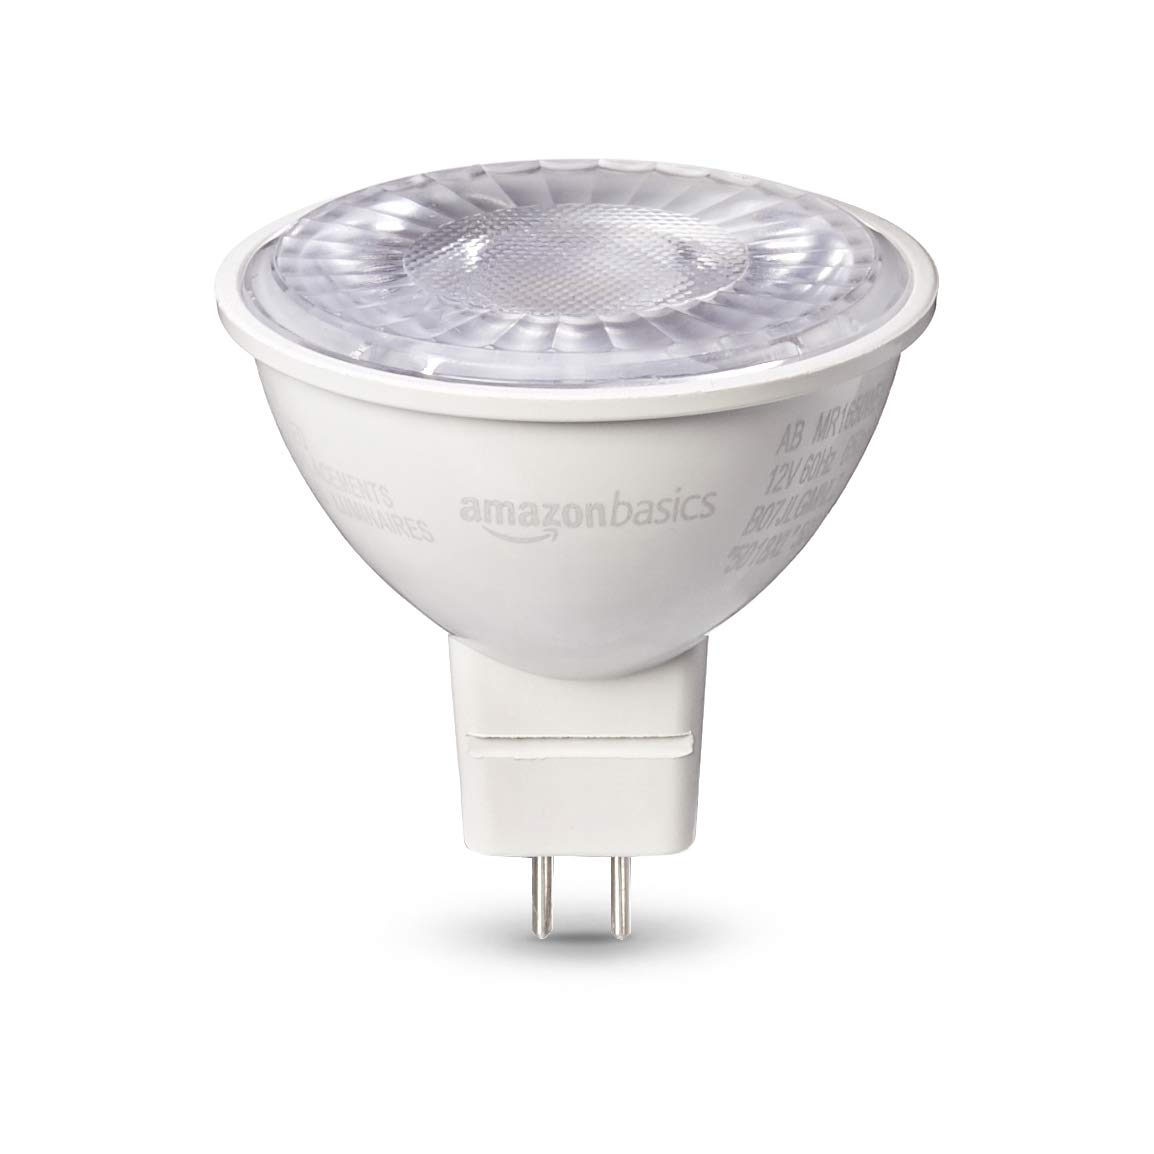 AmazonBasics 50W Equivalent, Warm White, Dimmable, 10,000 Hour Lifetime, MR16 (GU 5.3 Base) LED Light Bulb   6-Pack